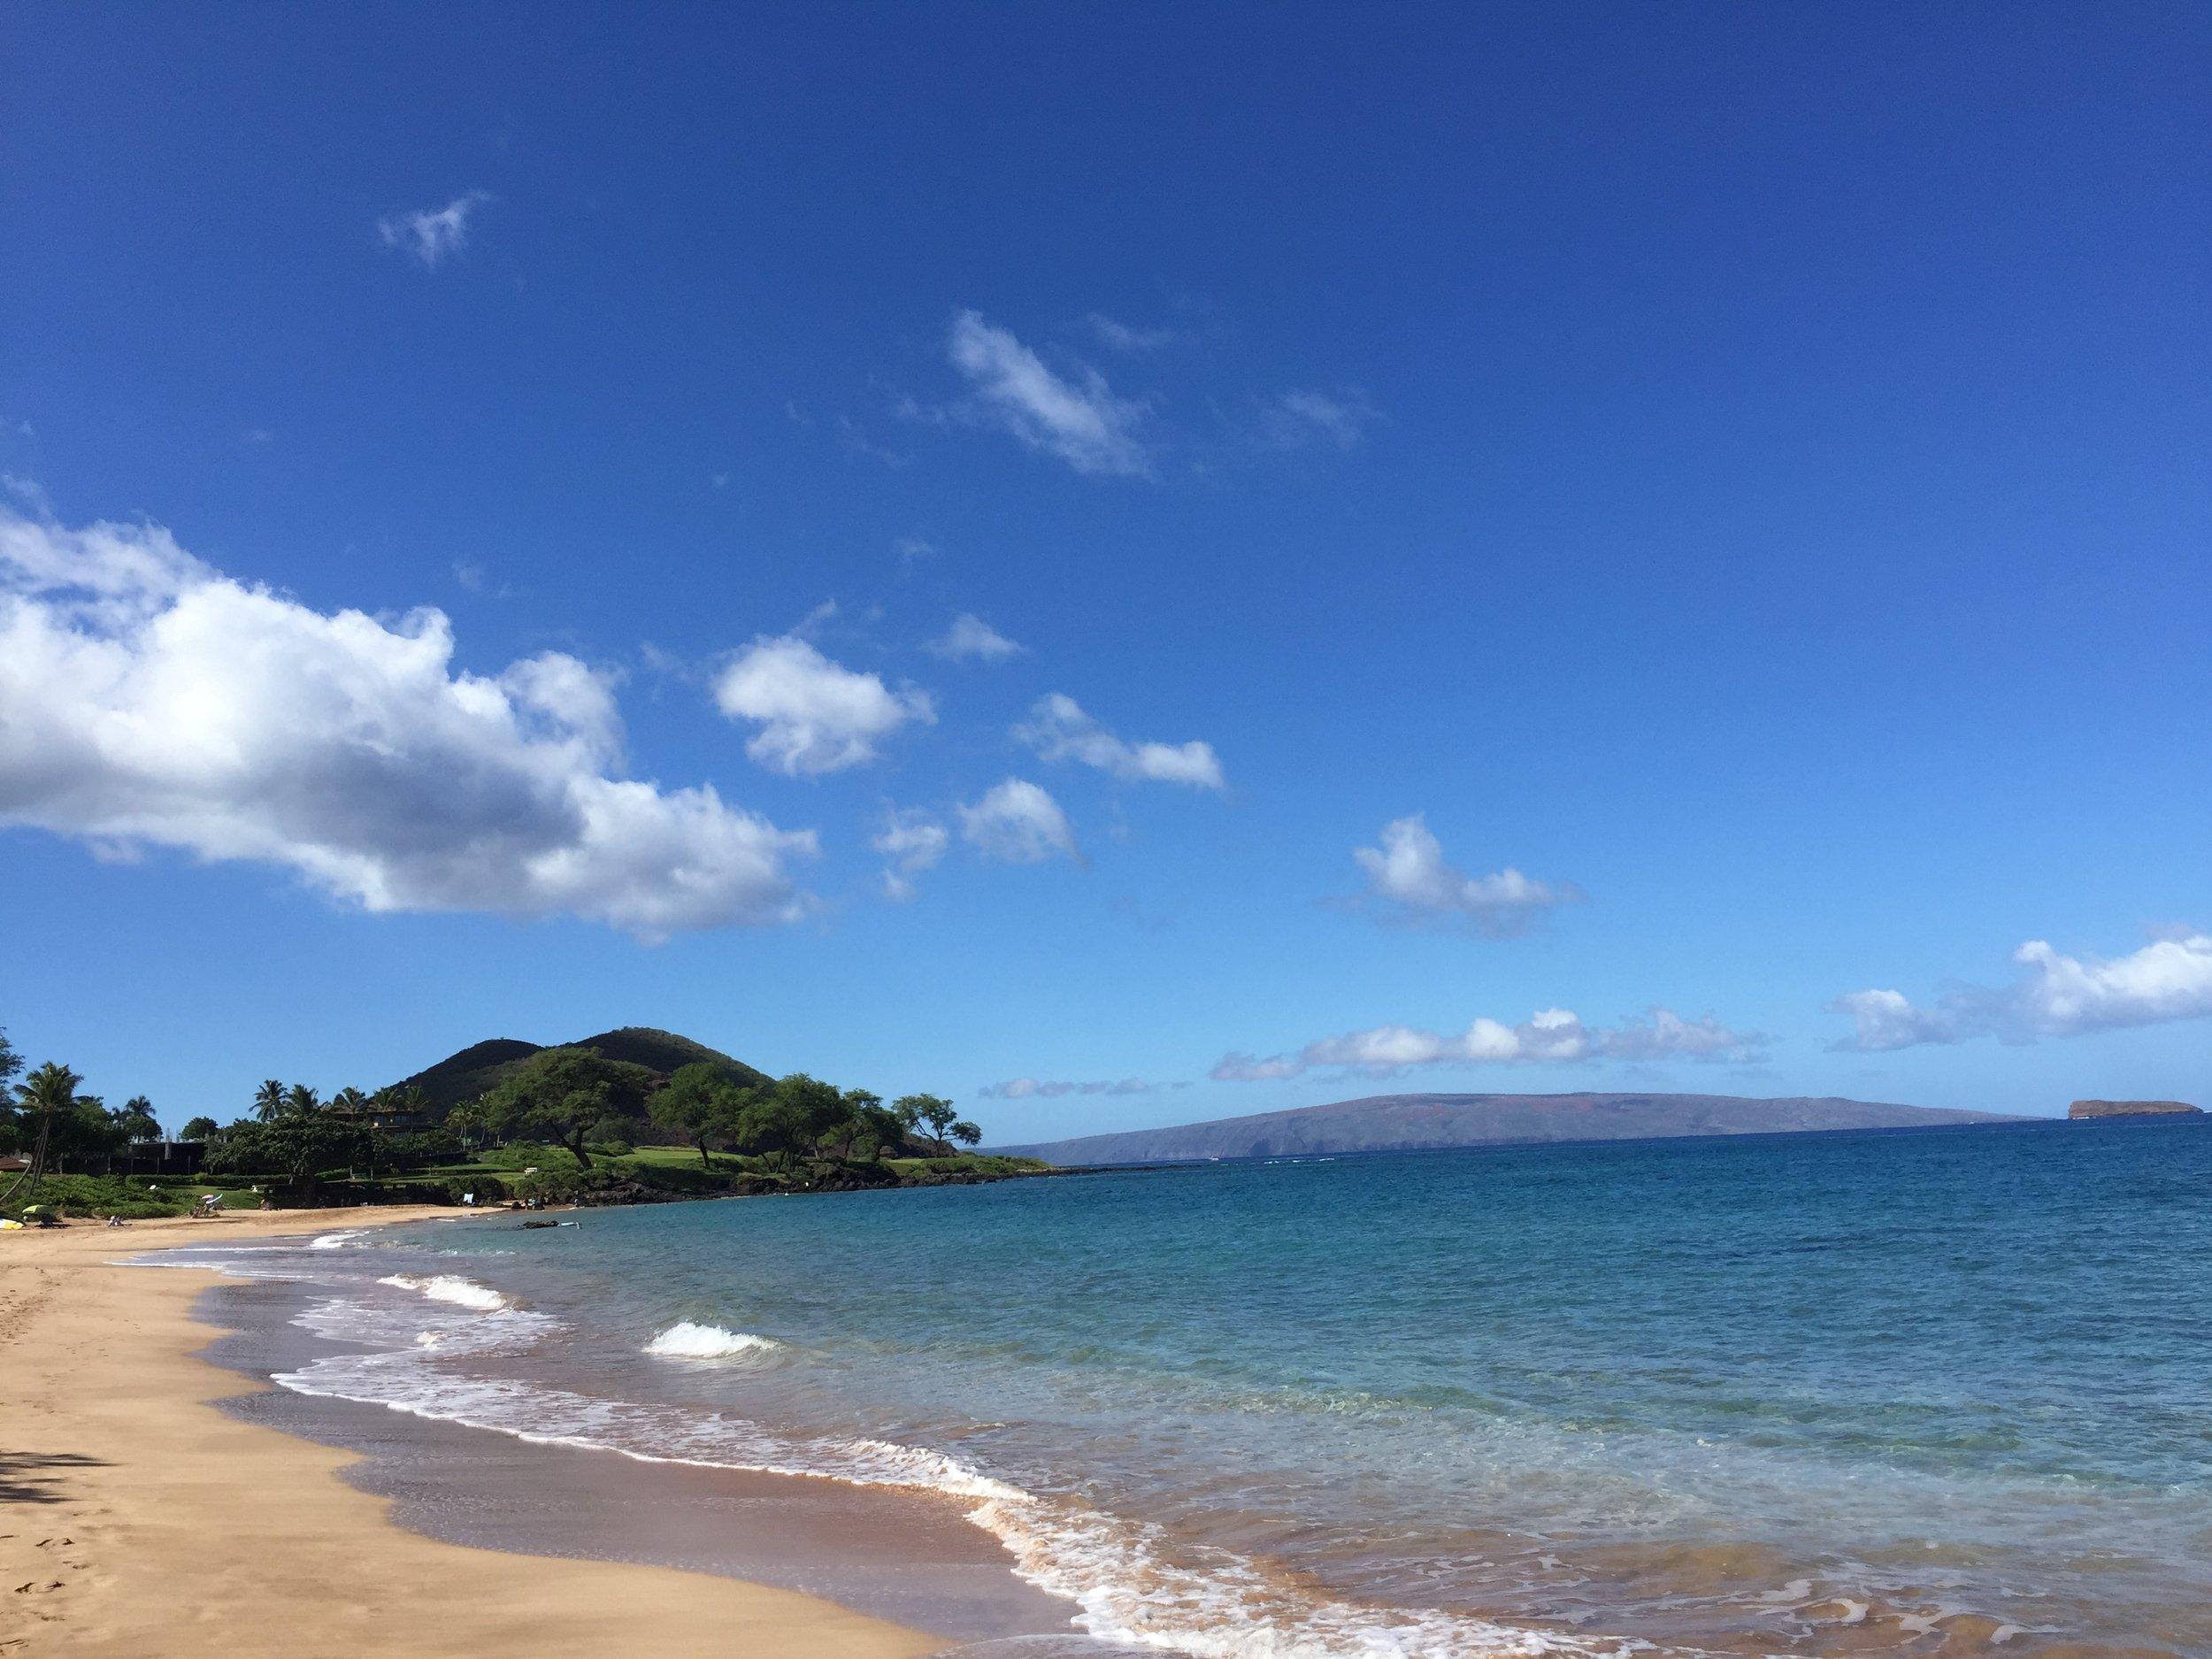 One of Maui's many beautiful beaches